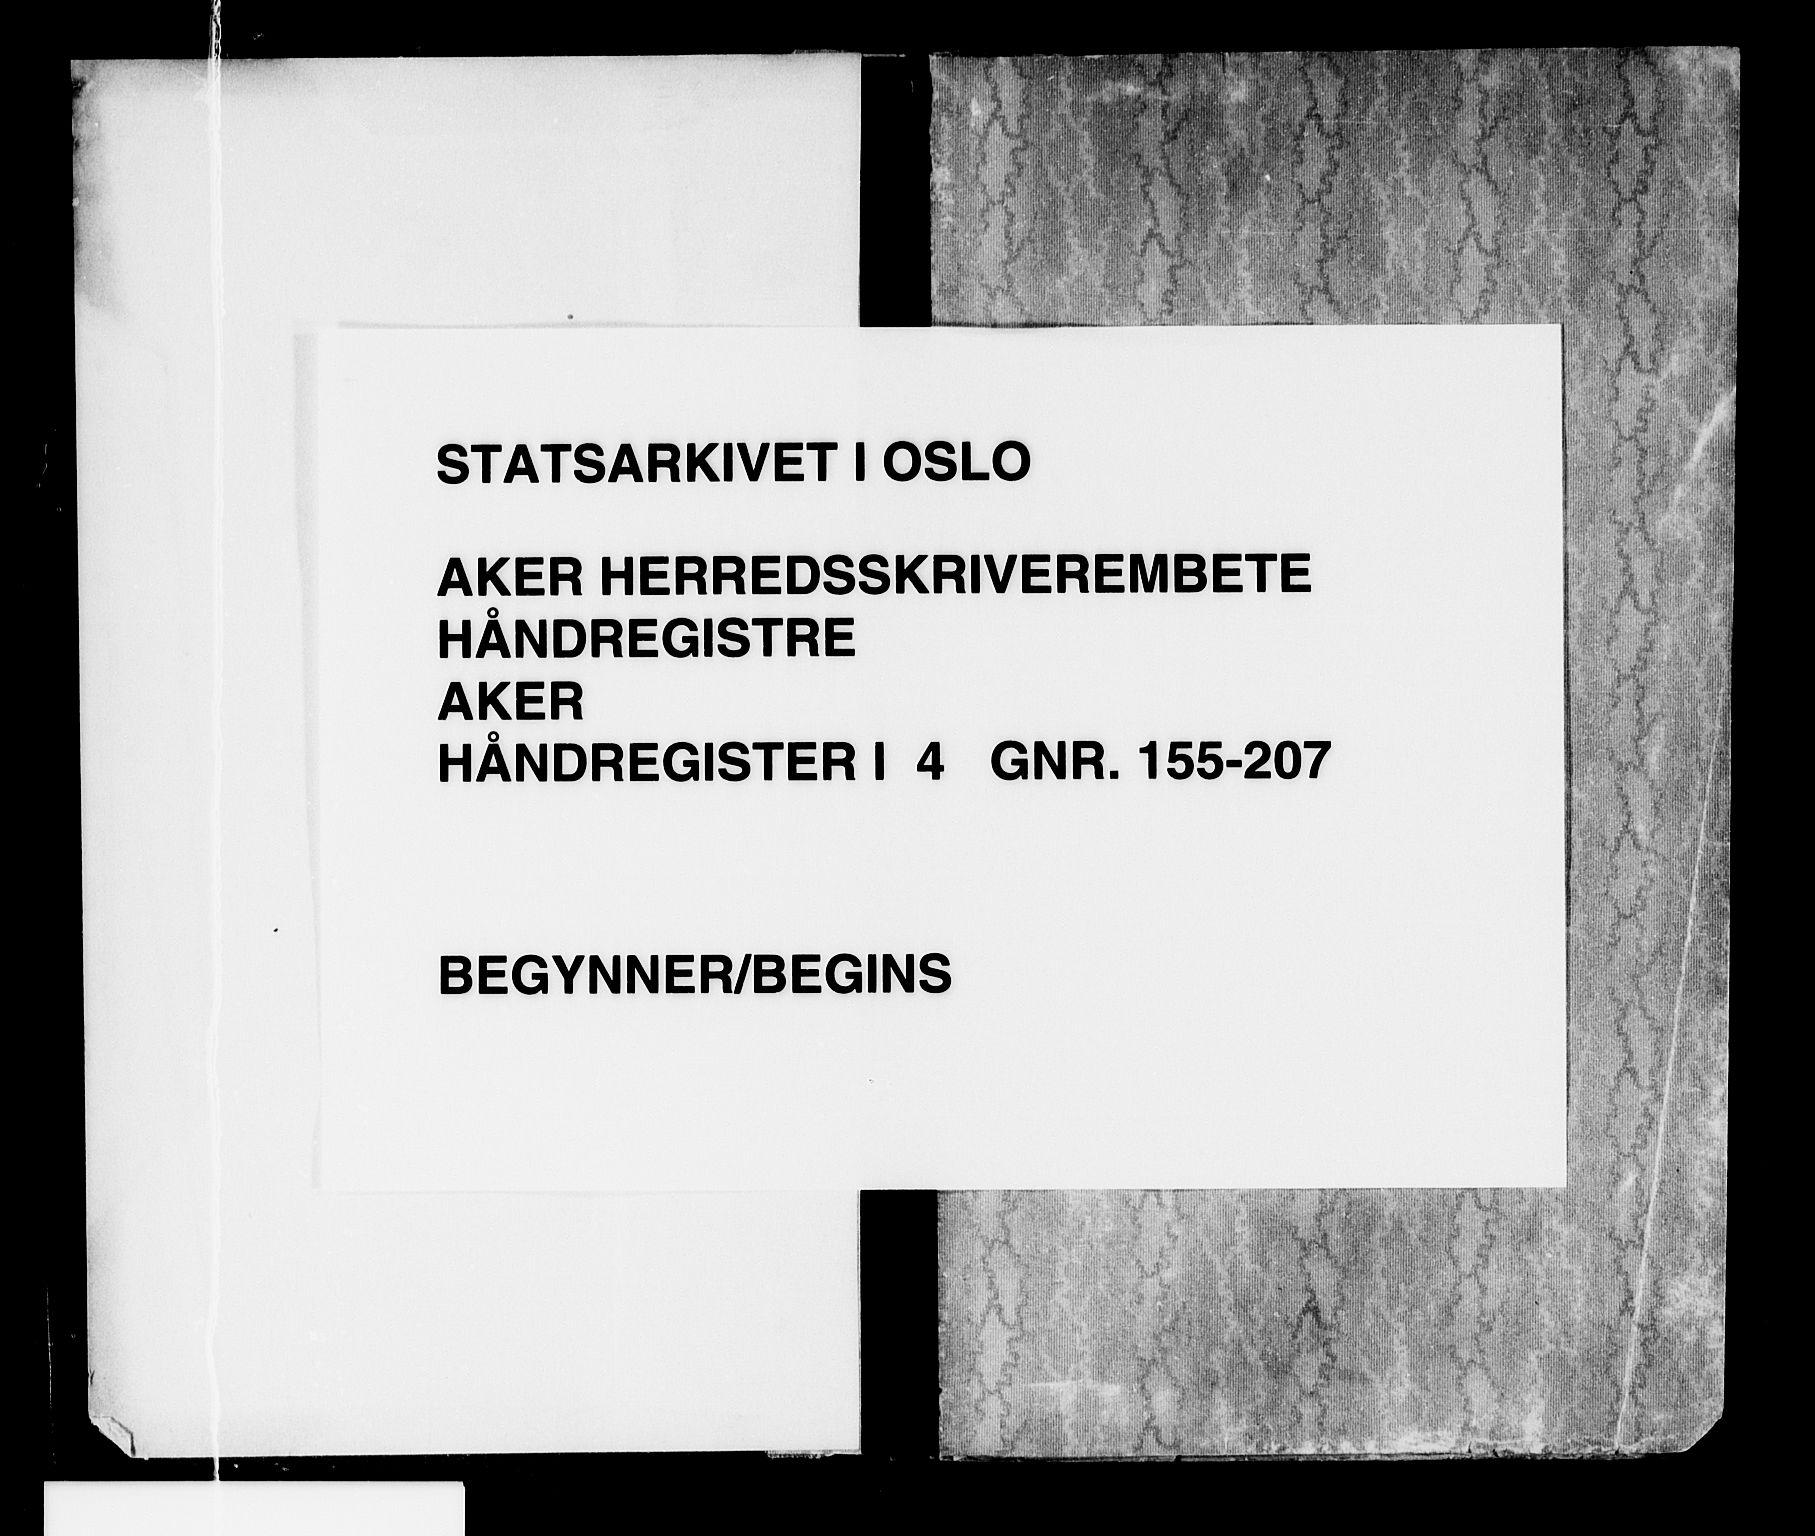 SAO, Aker herredsskriveri, G/Ga/Gaa/Gaaa/L0004: Panteregister nr. I 4, 1892-1950